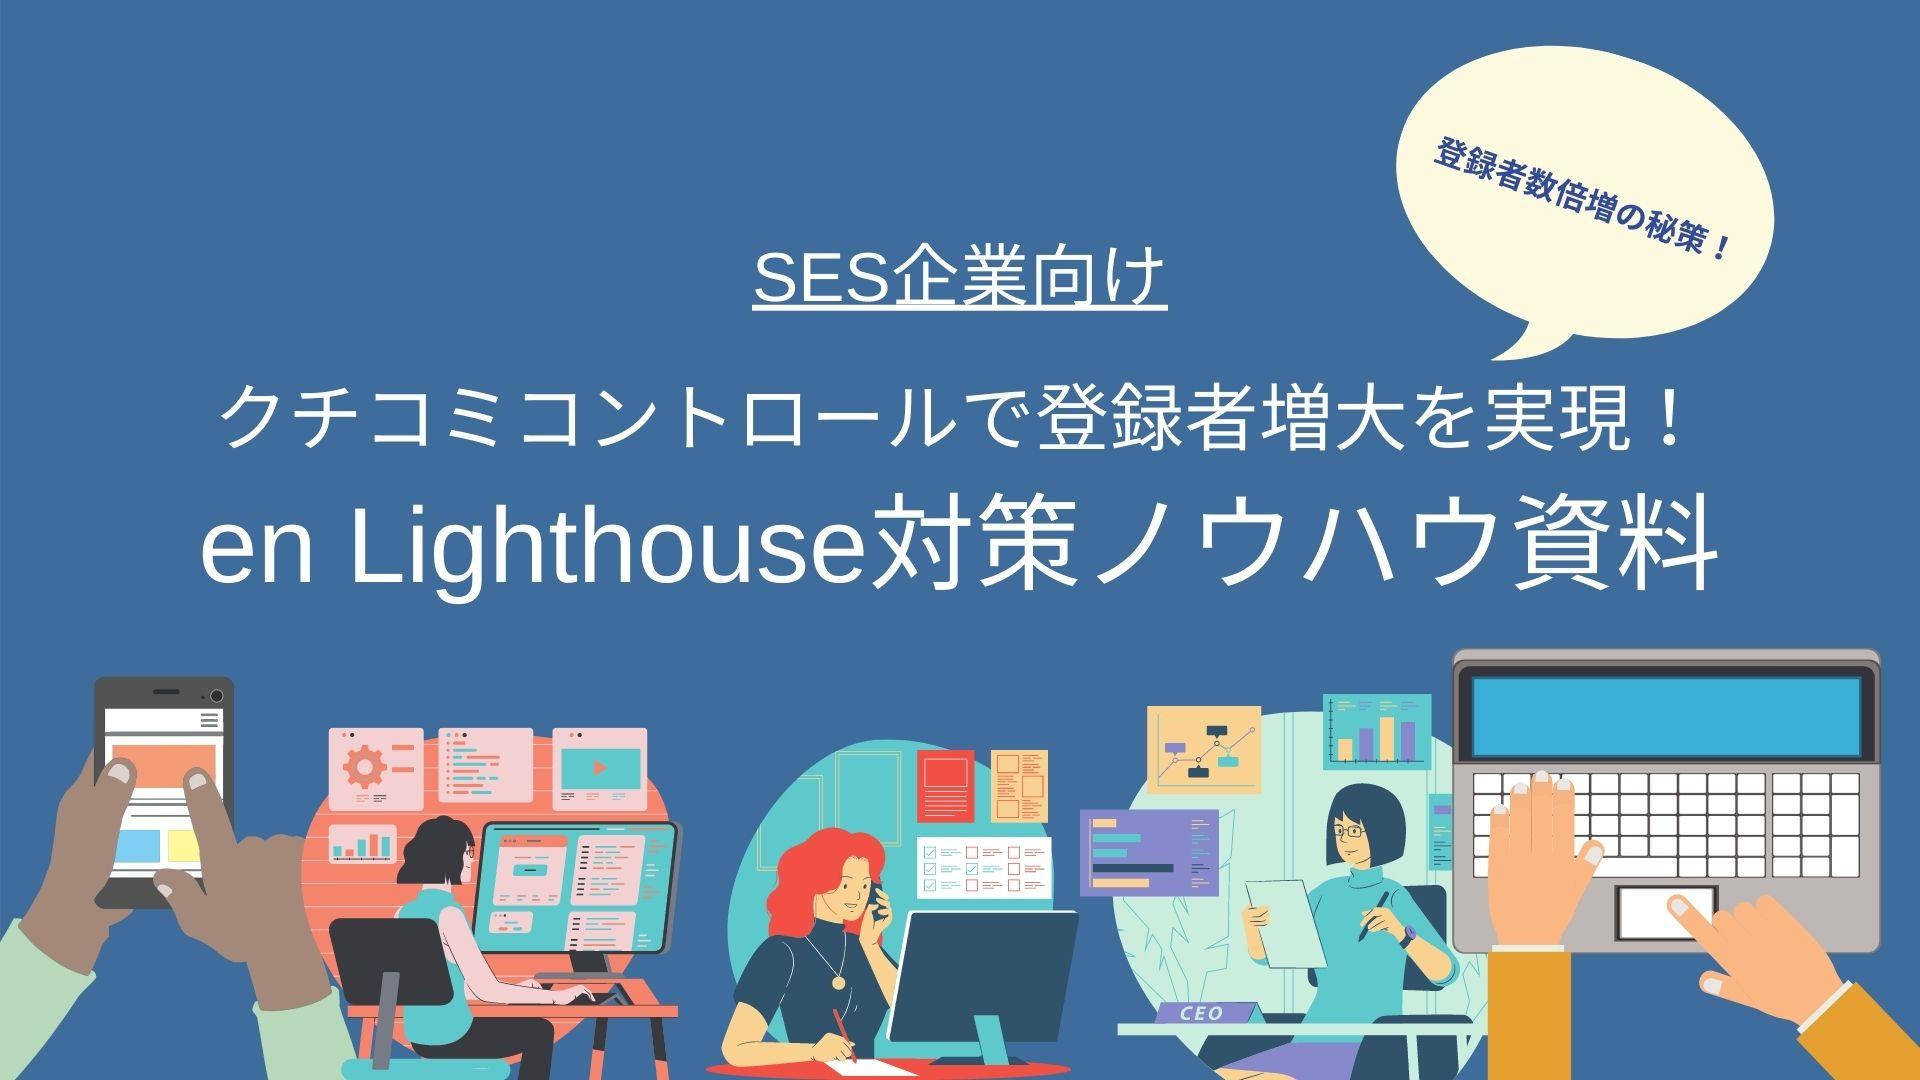 【SES企業注目!】優秀な人材囲えてる?登録者を一気に増大させるクチコミ対策ノウハウノウハウ資料を公開!